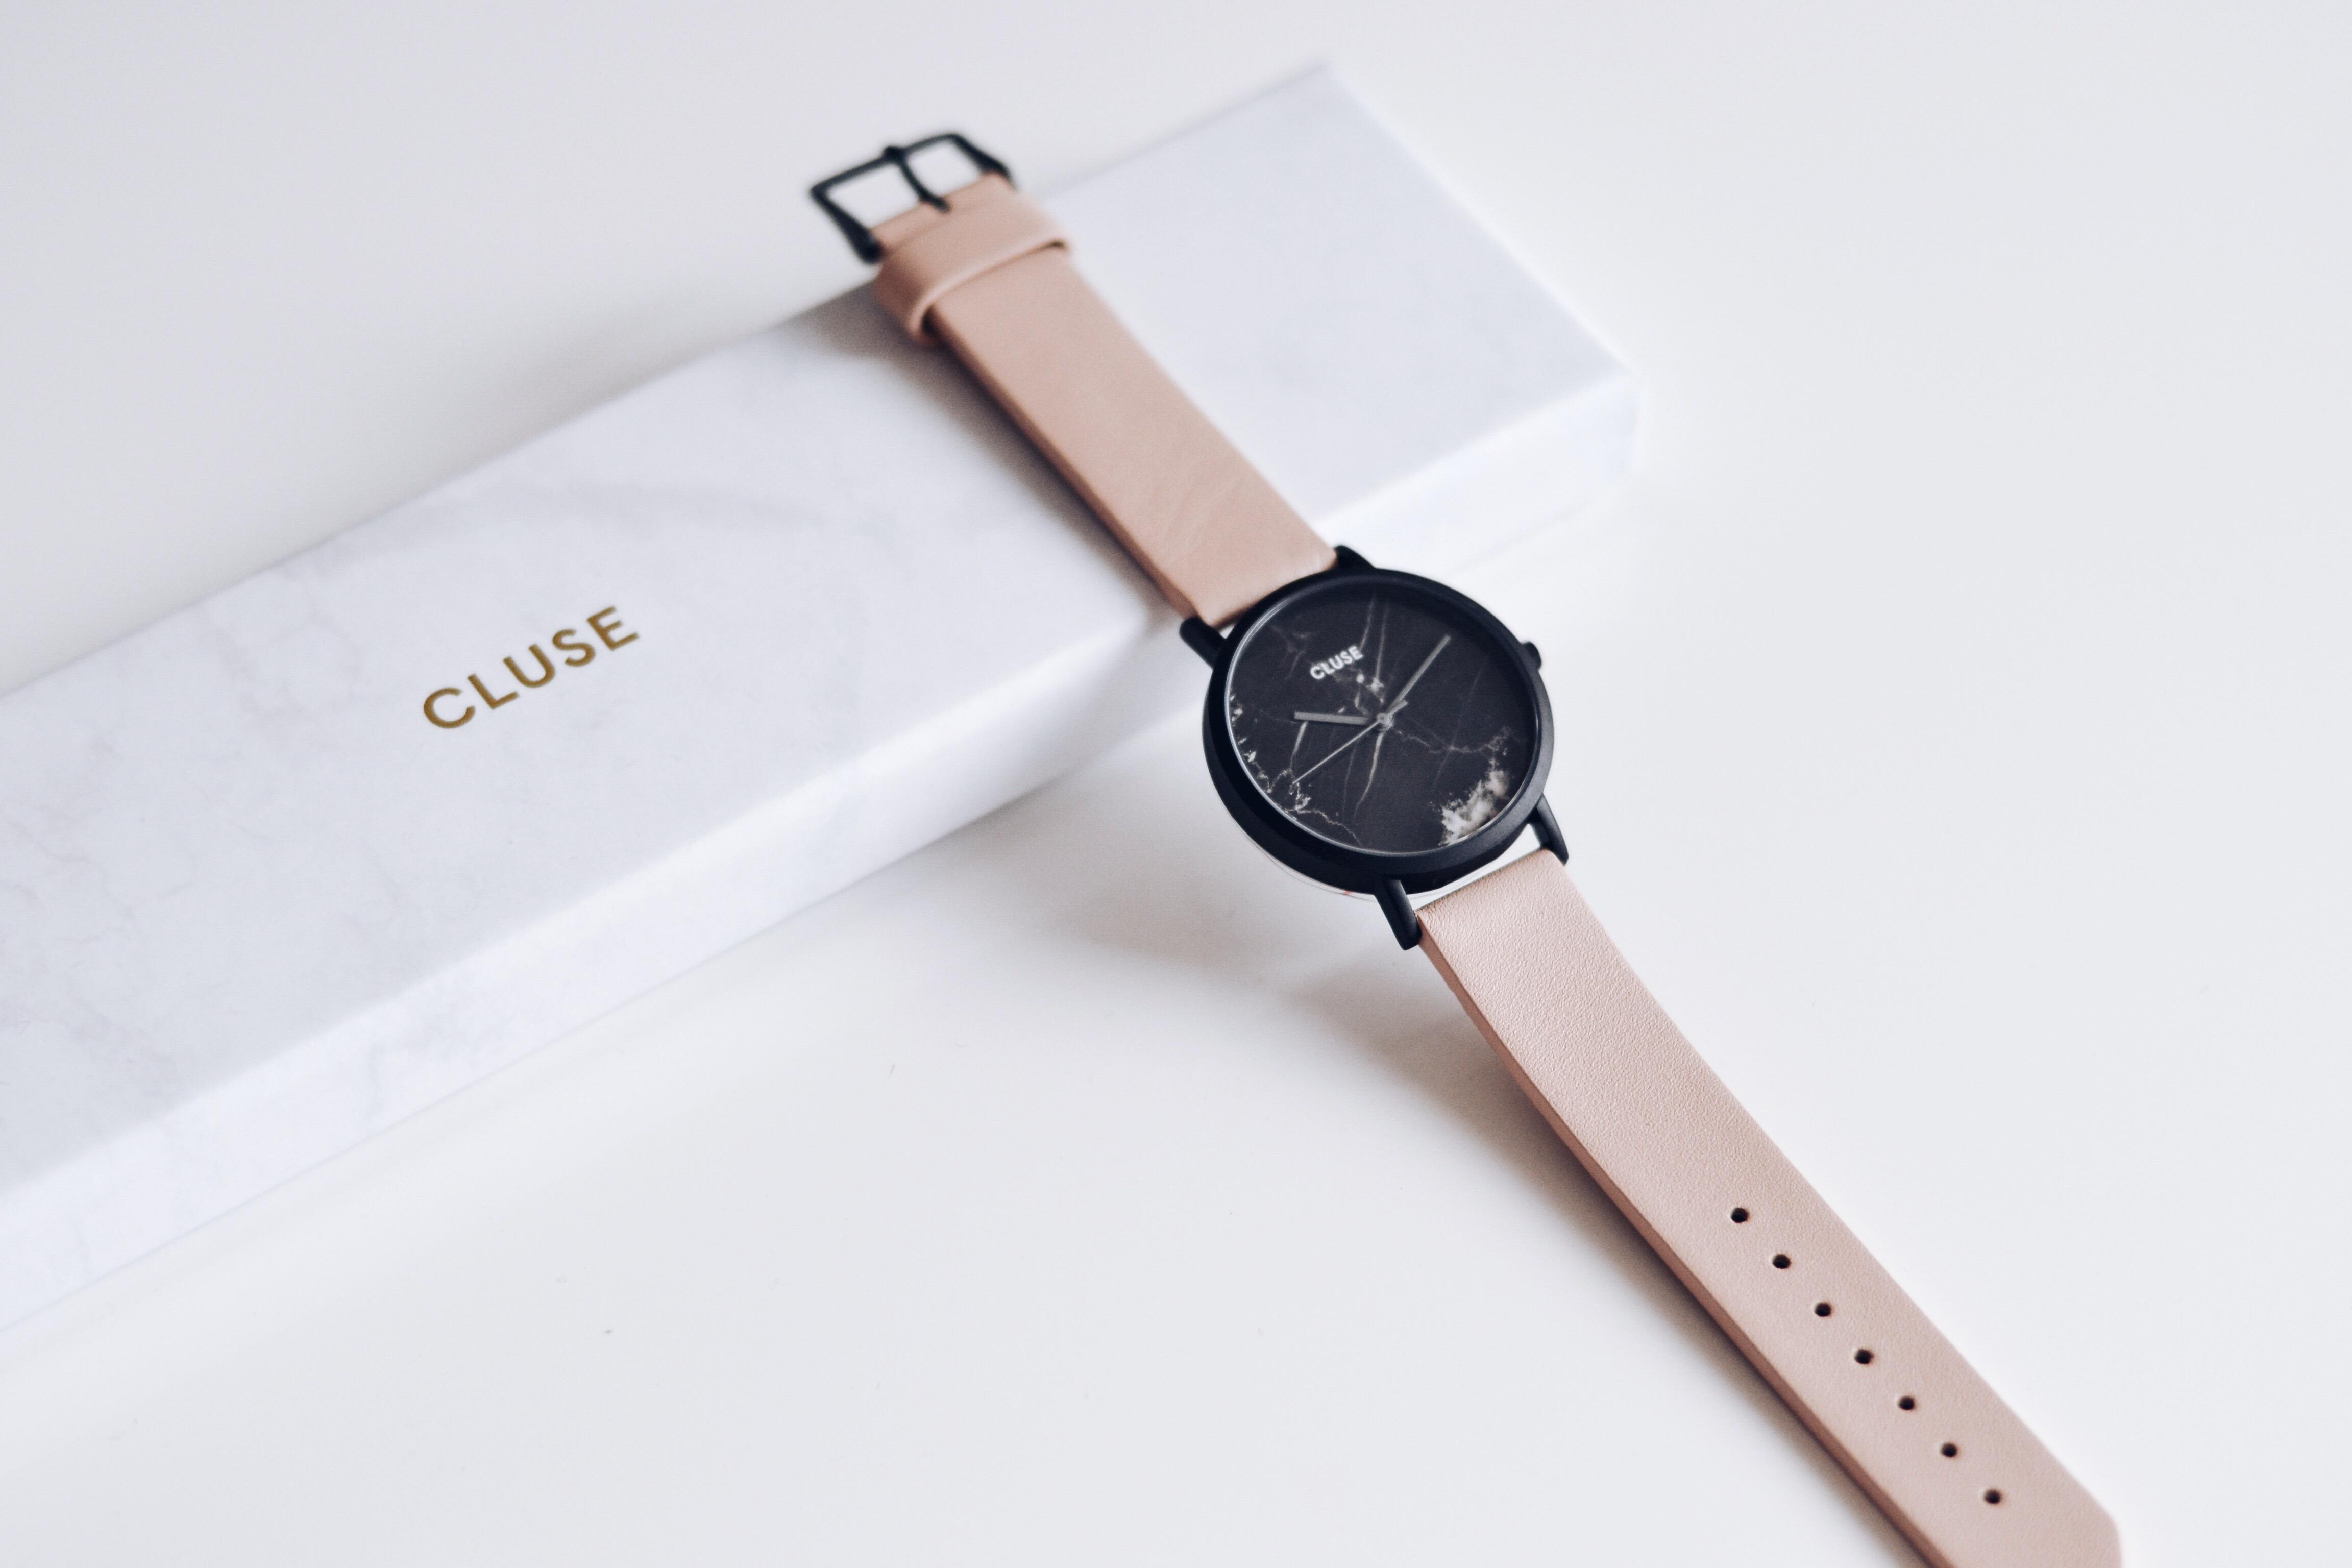 allthatchoices-minimalistic-watch-cluse-marble-rose-altrosa-schwarz-marmor-armbanduhr-scandi-scandinavian-style-fashionblogger-rosequartz-minimal-1